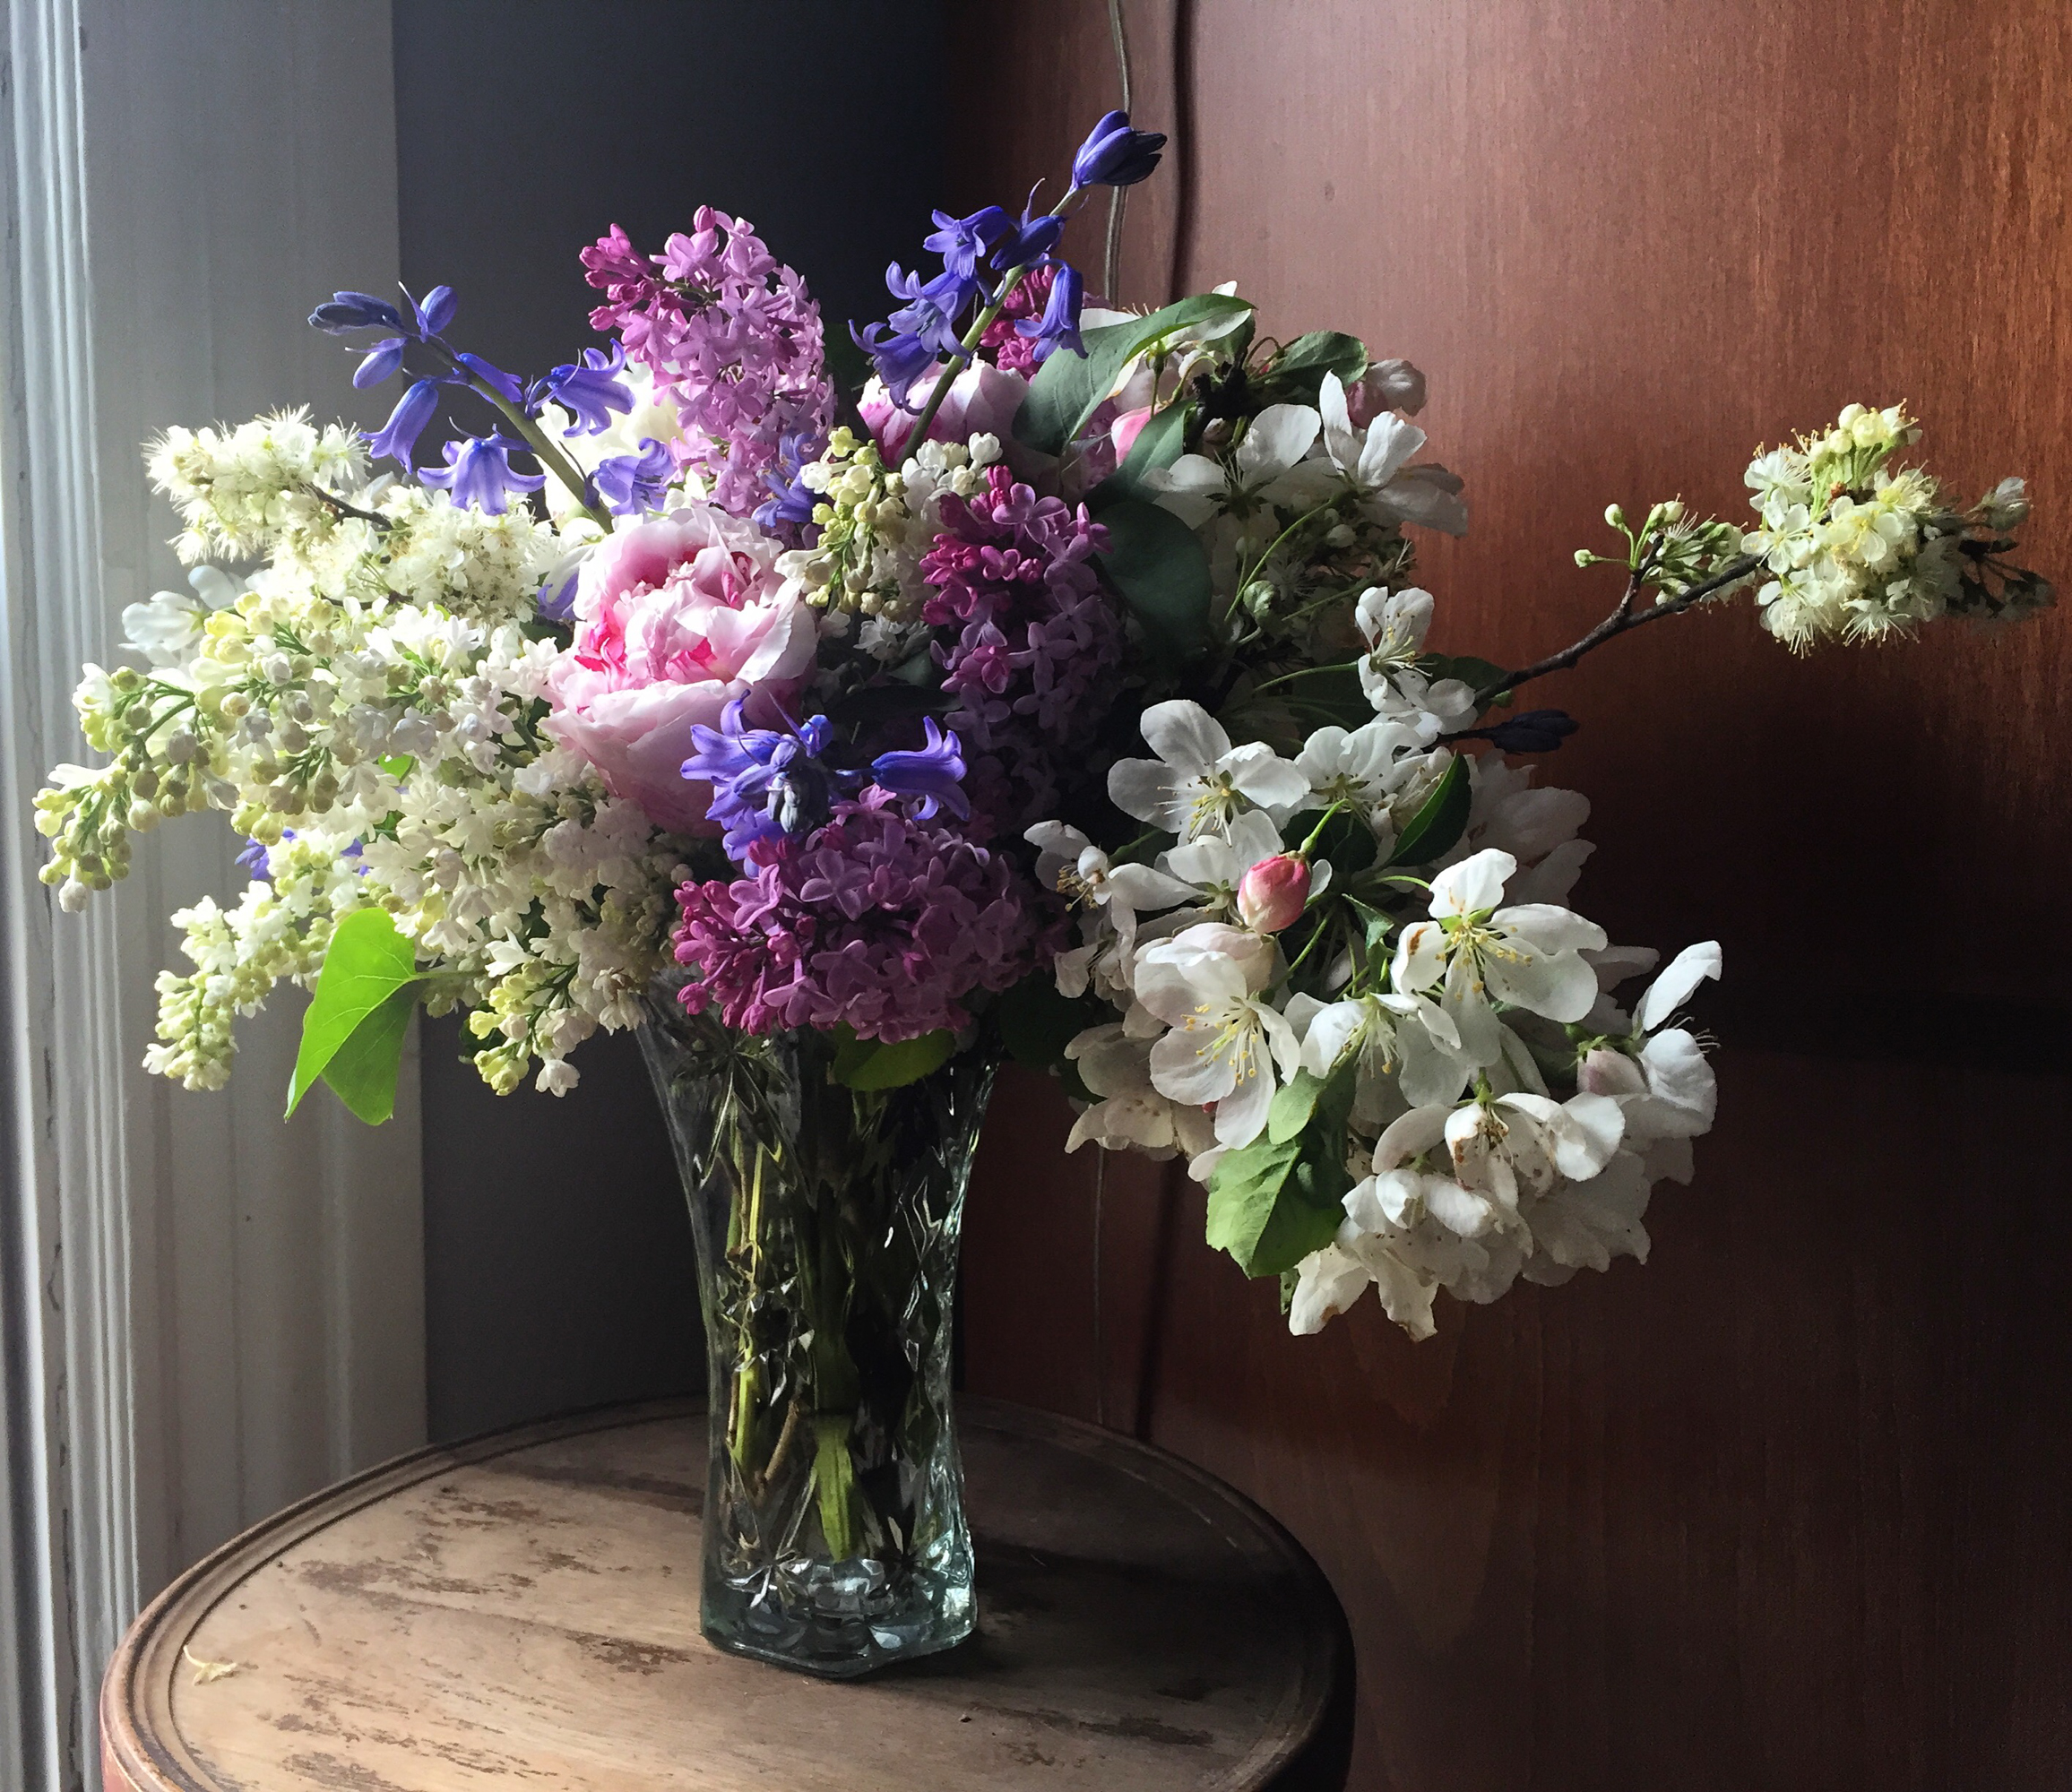 Ephemera Designs Floral Photography of white and purple flower arrangement in vase